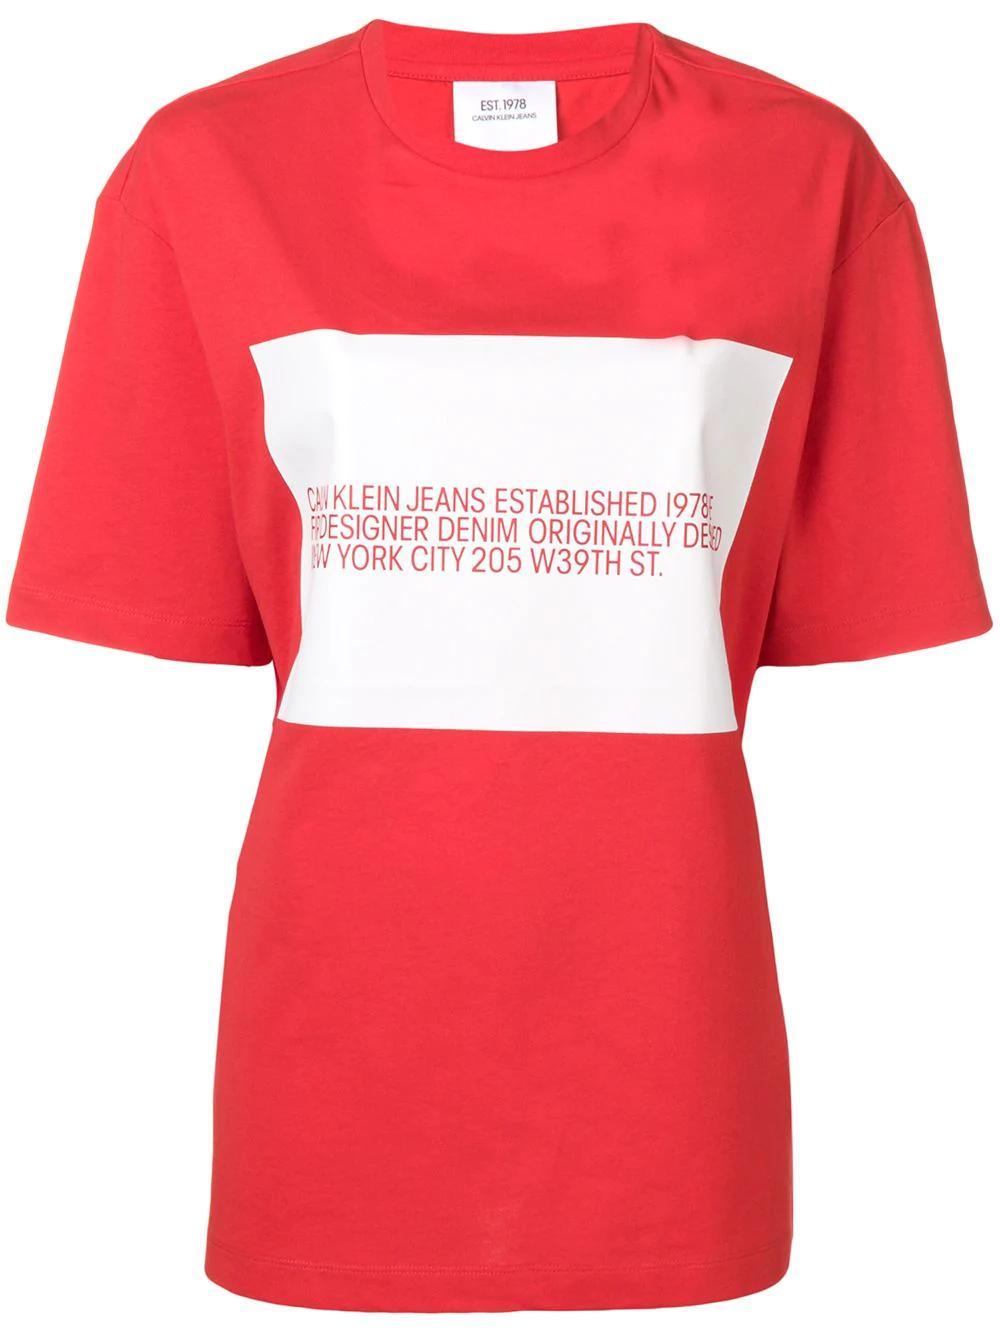 ca4e7bbd787f Calvin Klein Jeans Est. 1978 Logo Print T-Shirt - Red In 600 Red ...